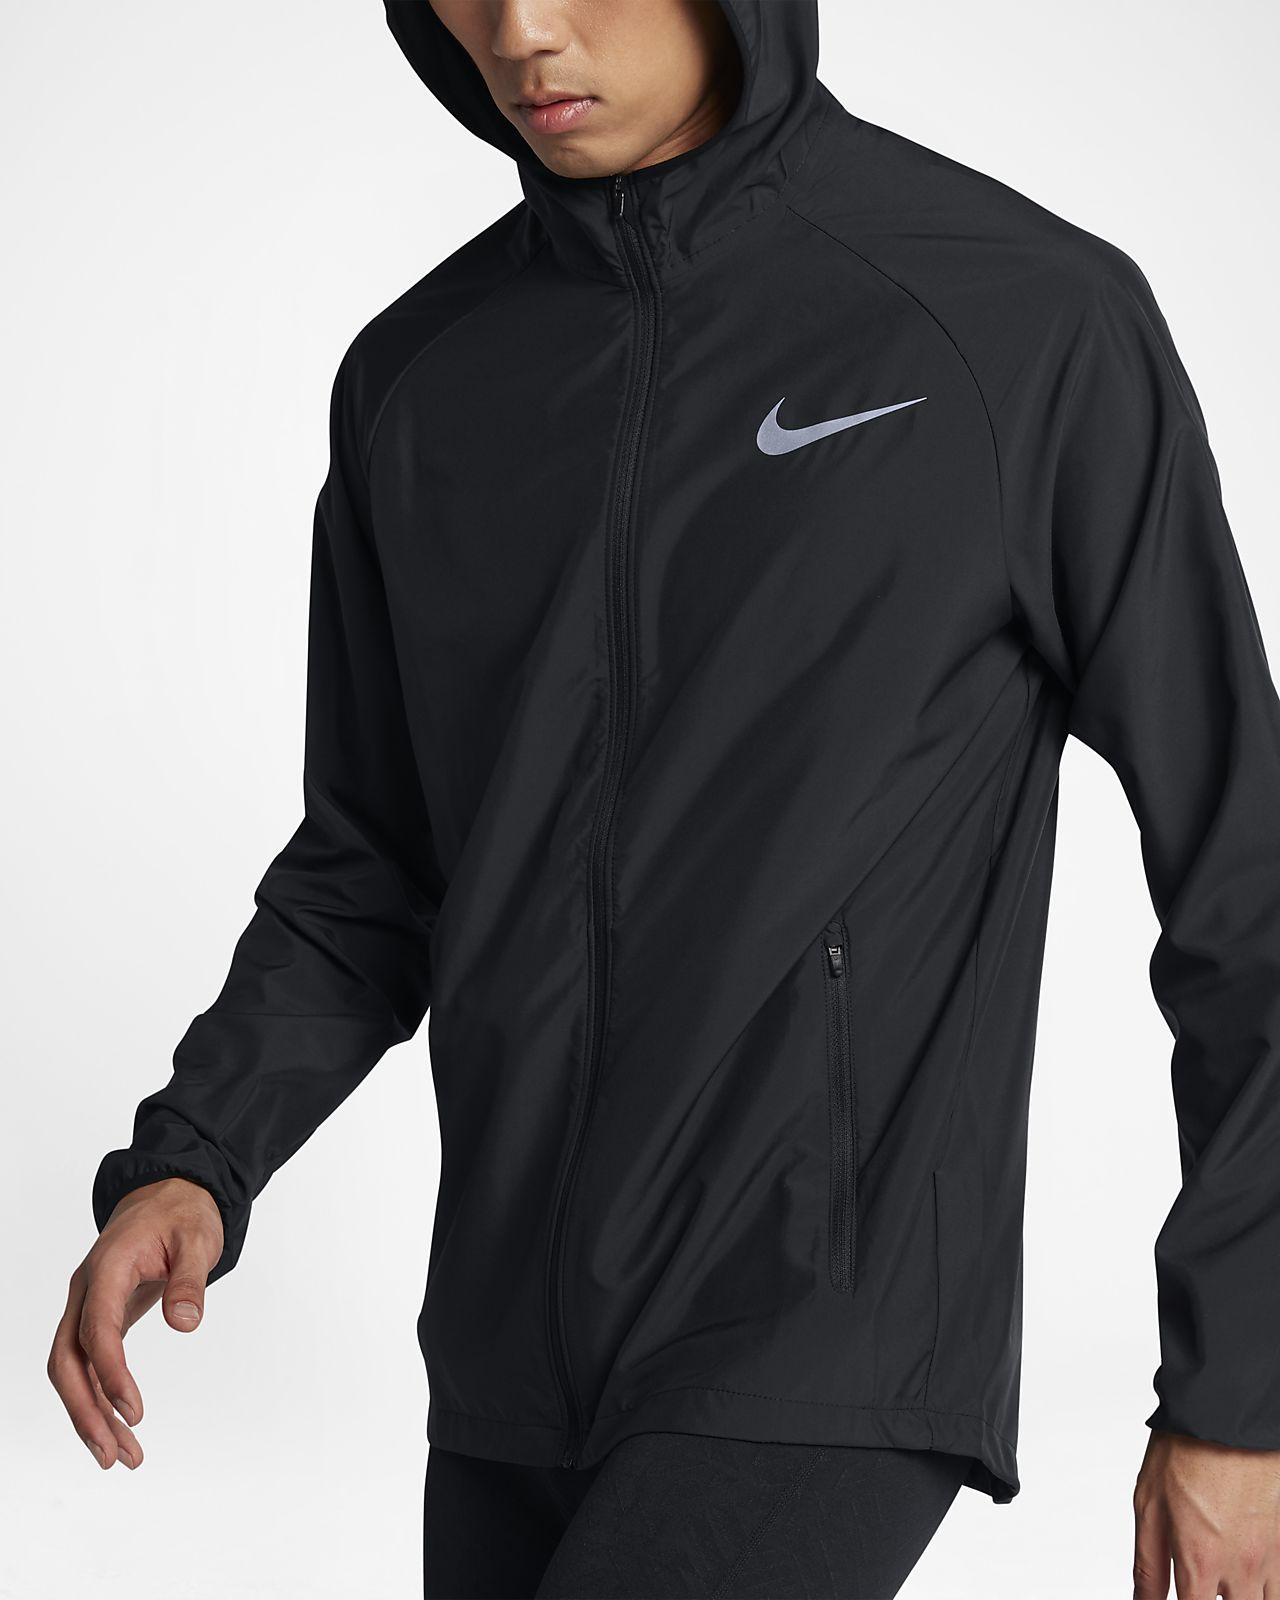 Homme De Essential Running Be Nike Veste Pour dTfXHxx